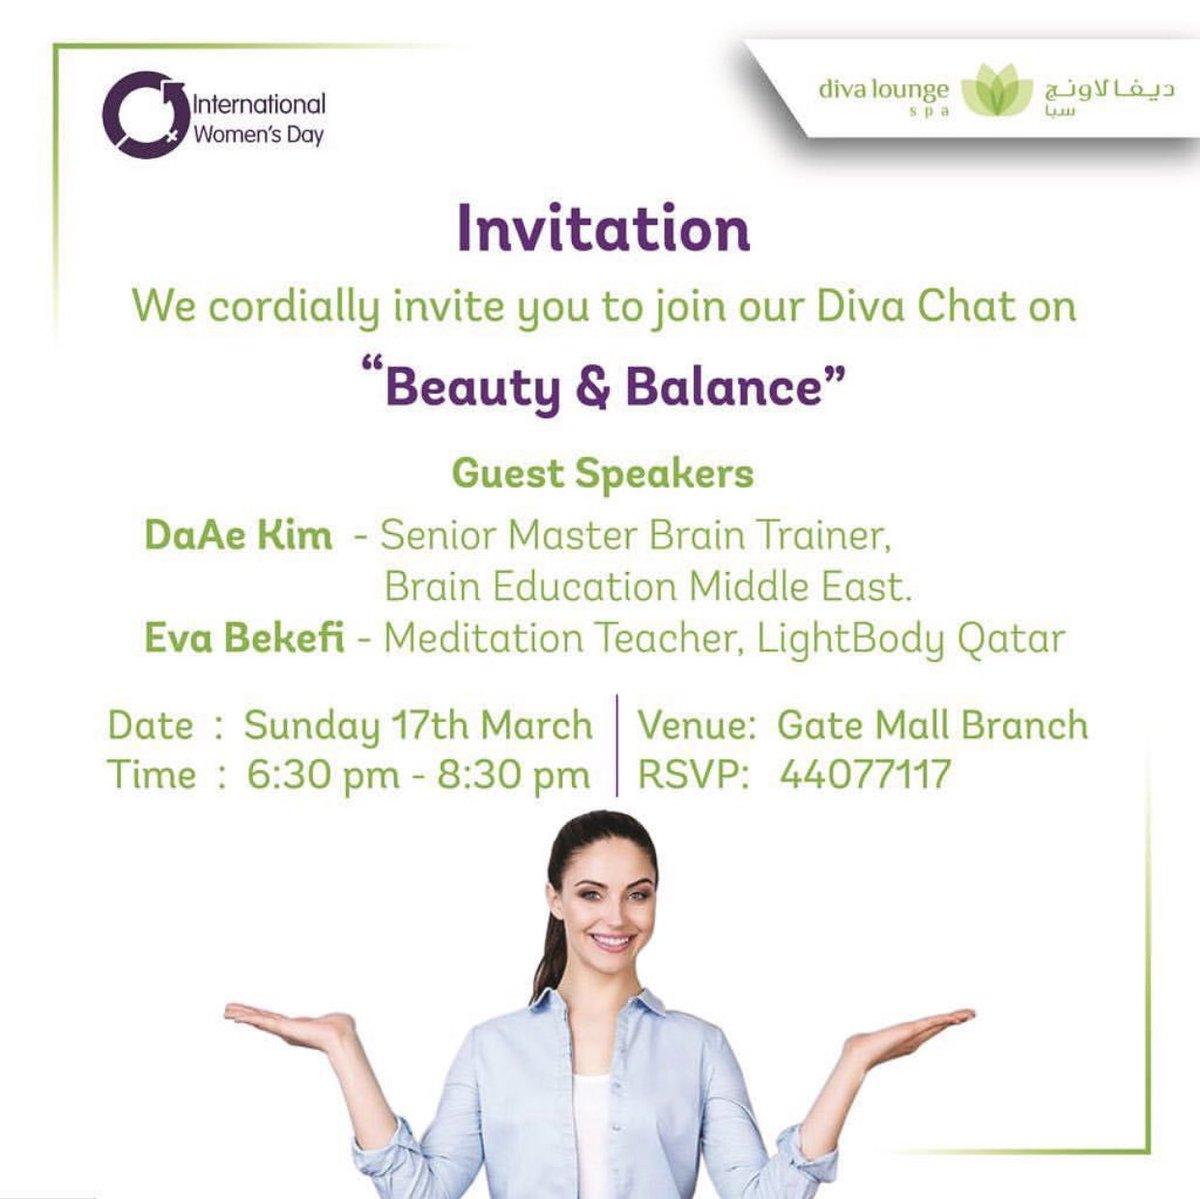 Qatar dating chat